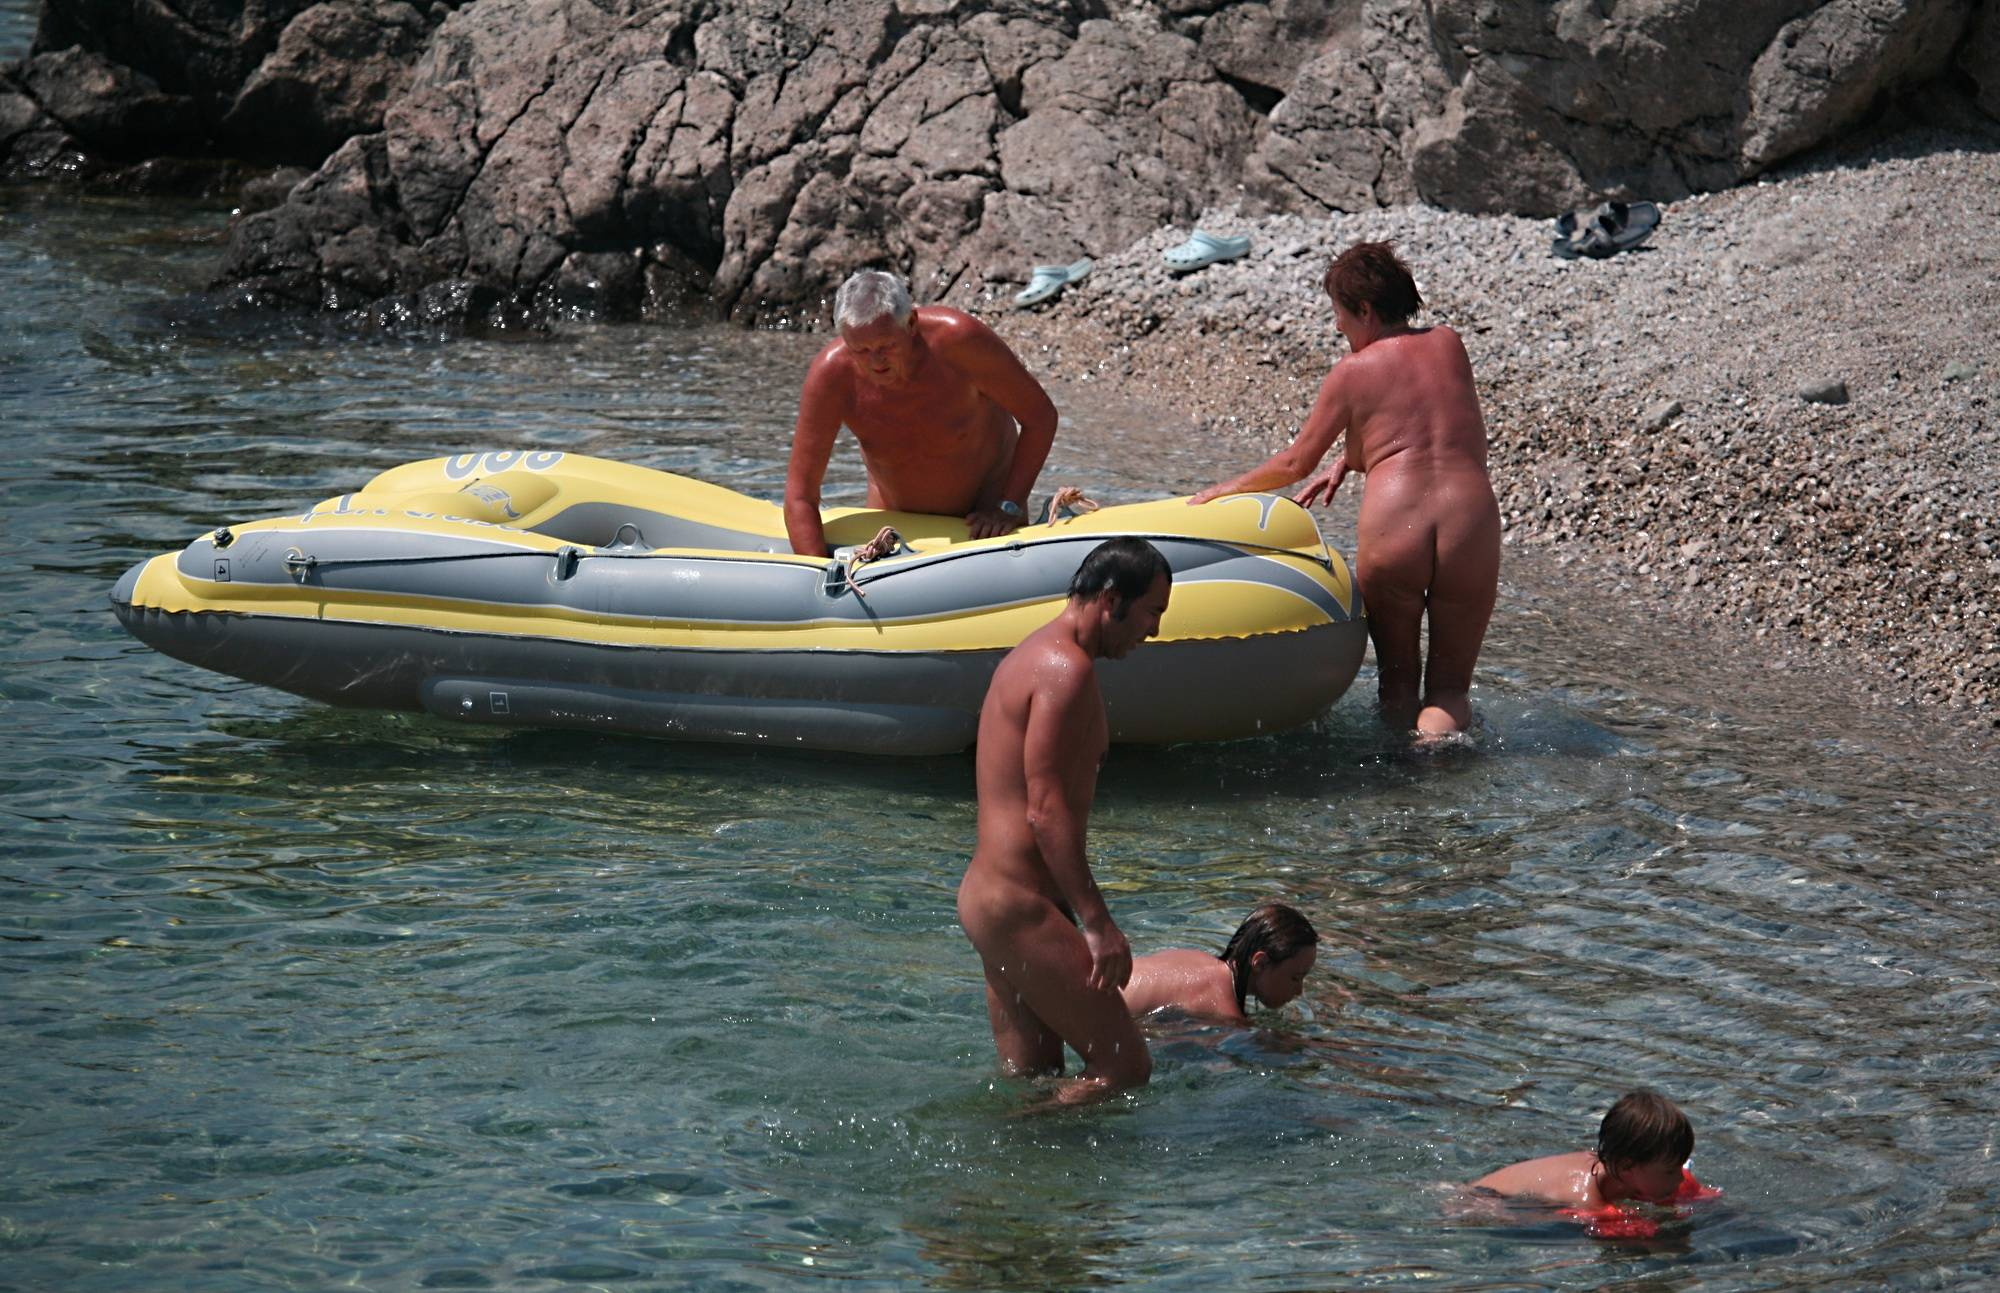 Purenudism Pics-Lone Nudist in Yellow Boat - 3